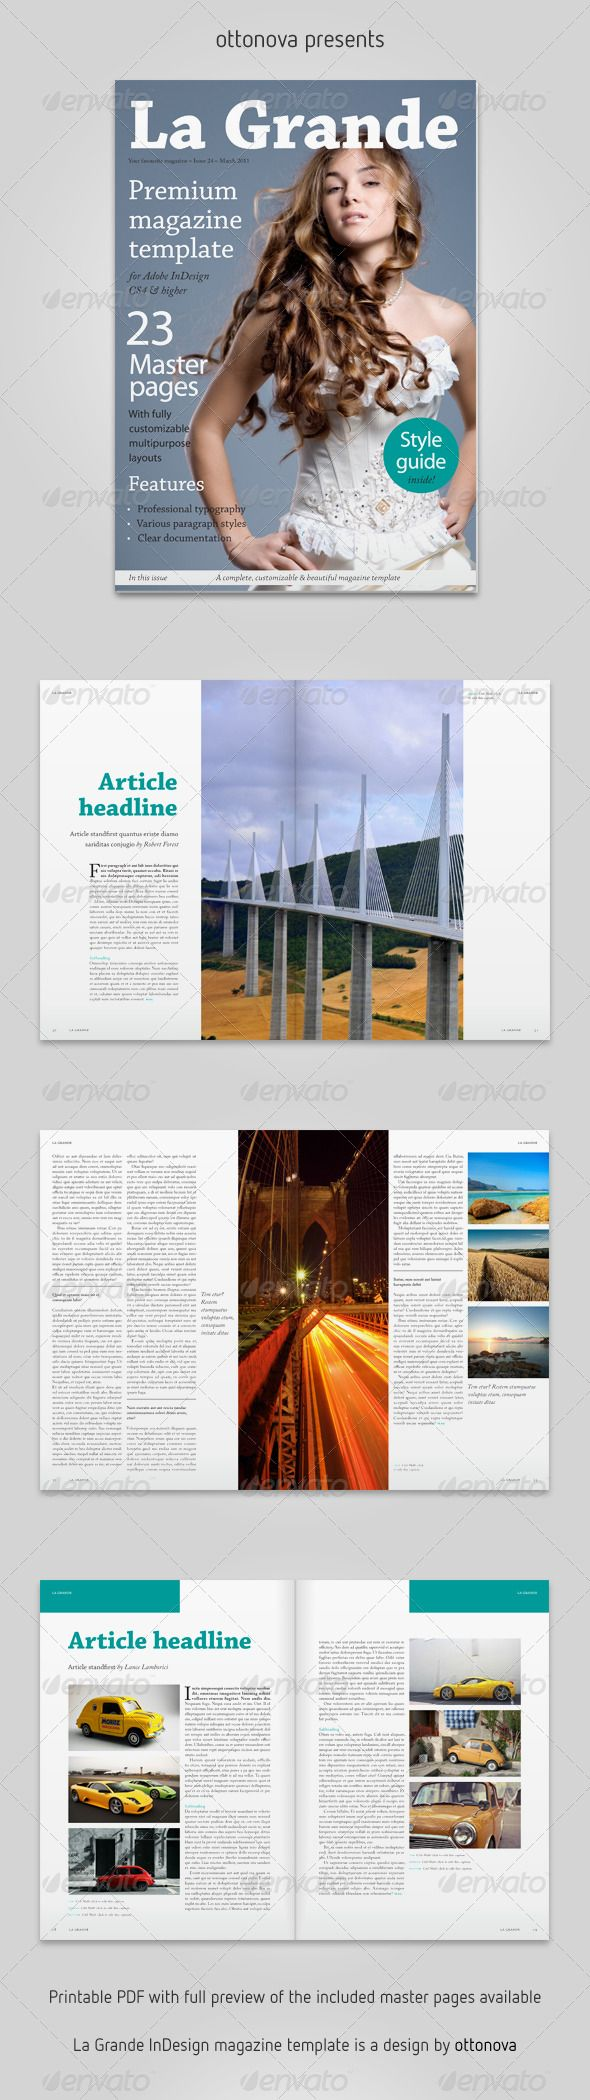 La Grande InDesign magazine template | Indesign magazine templates ...